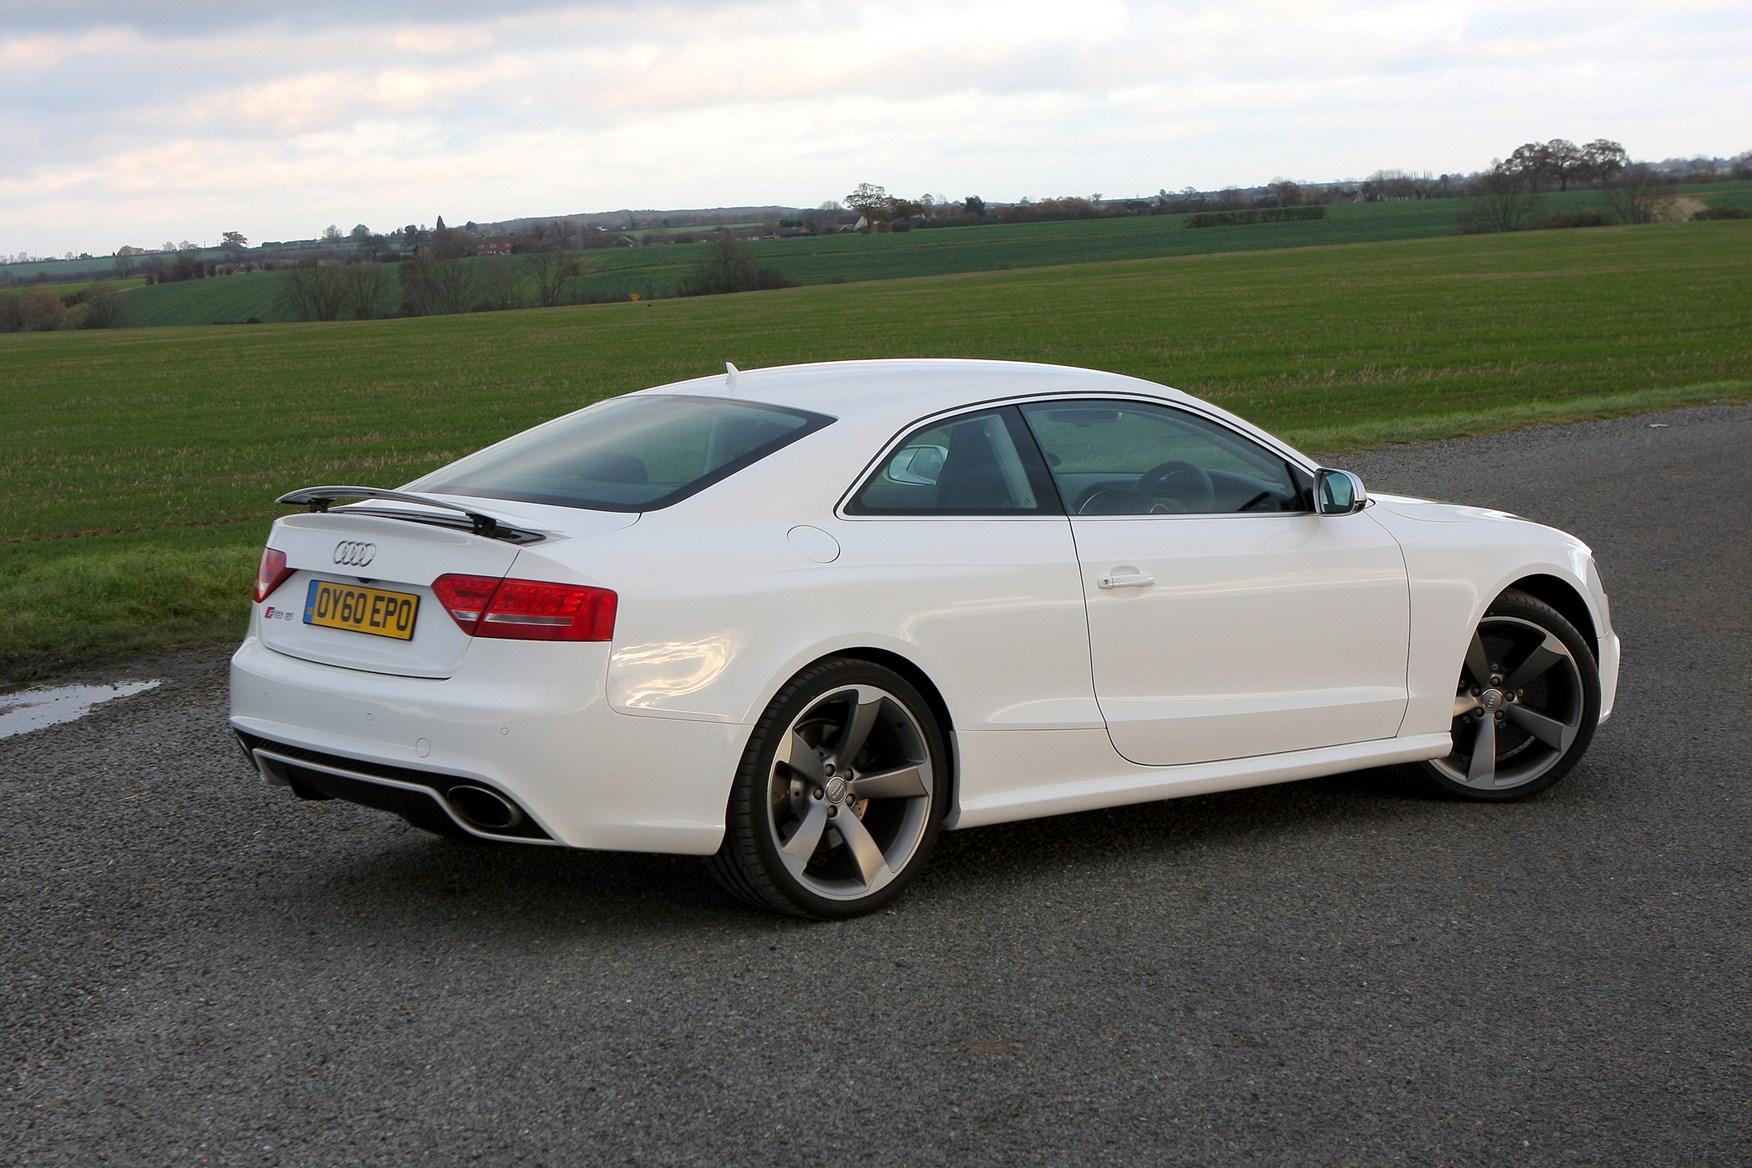 Audi S5 For Sale Craigslist >> Audi S5 For Sale Craigslist Southamptonafricanamericanmuseum Org